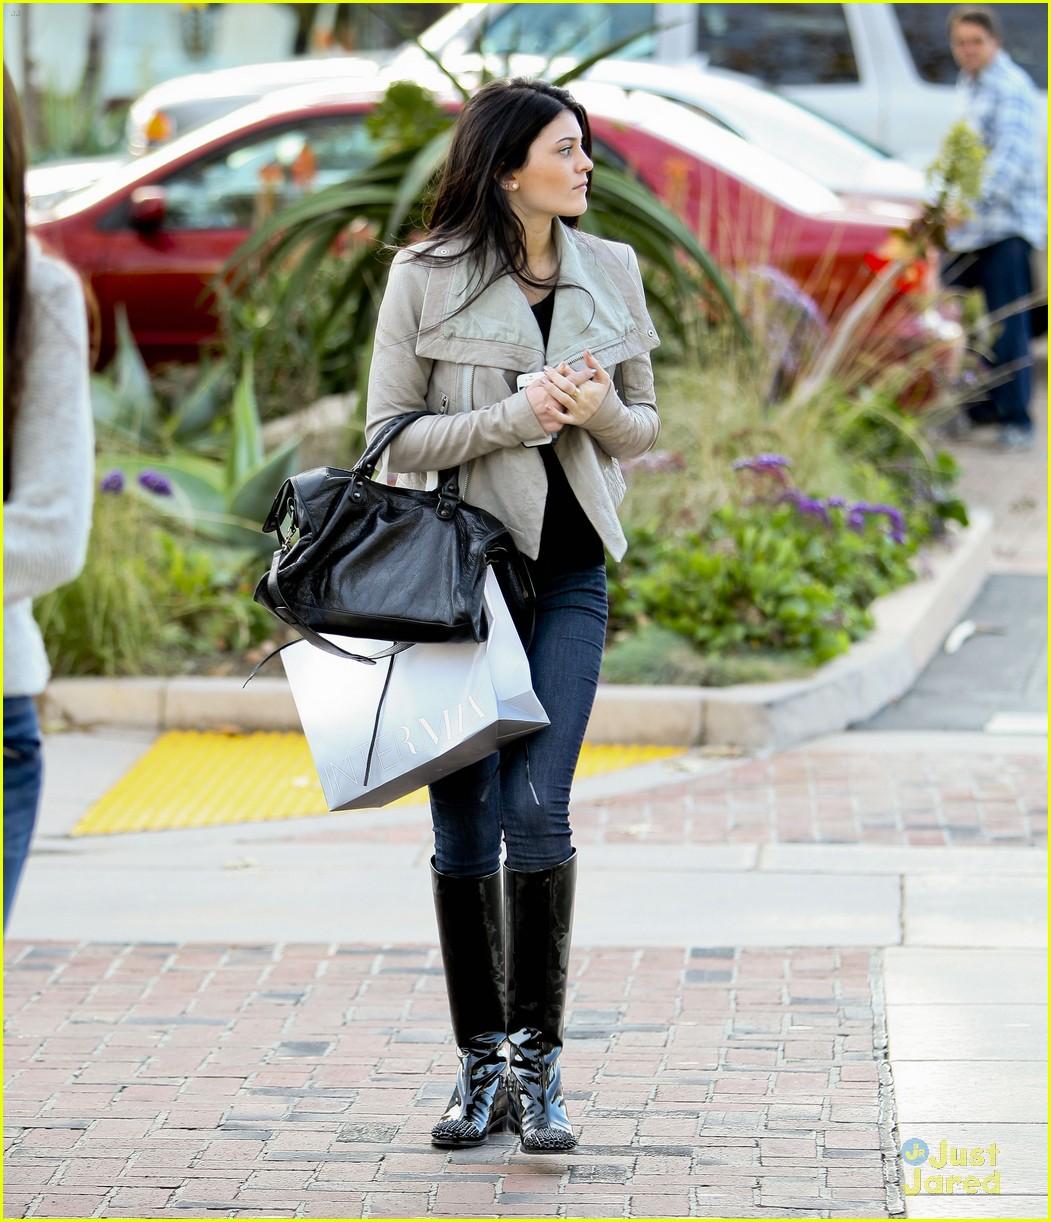 Malibu Nights Concert: Kylie & Kendall Jenner: Malibu Shoppers